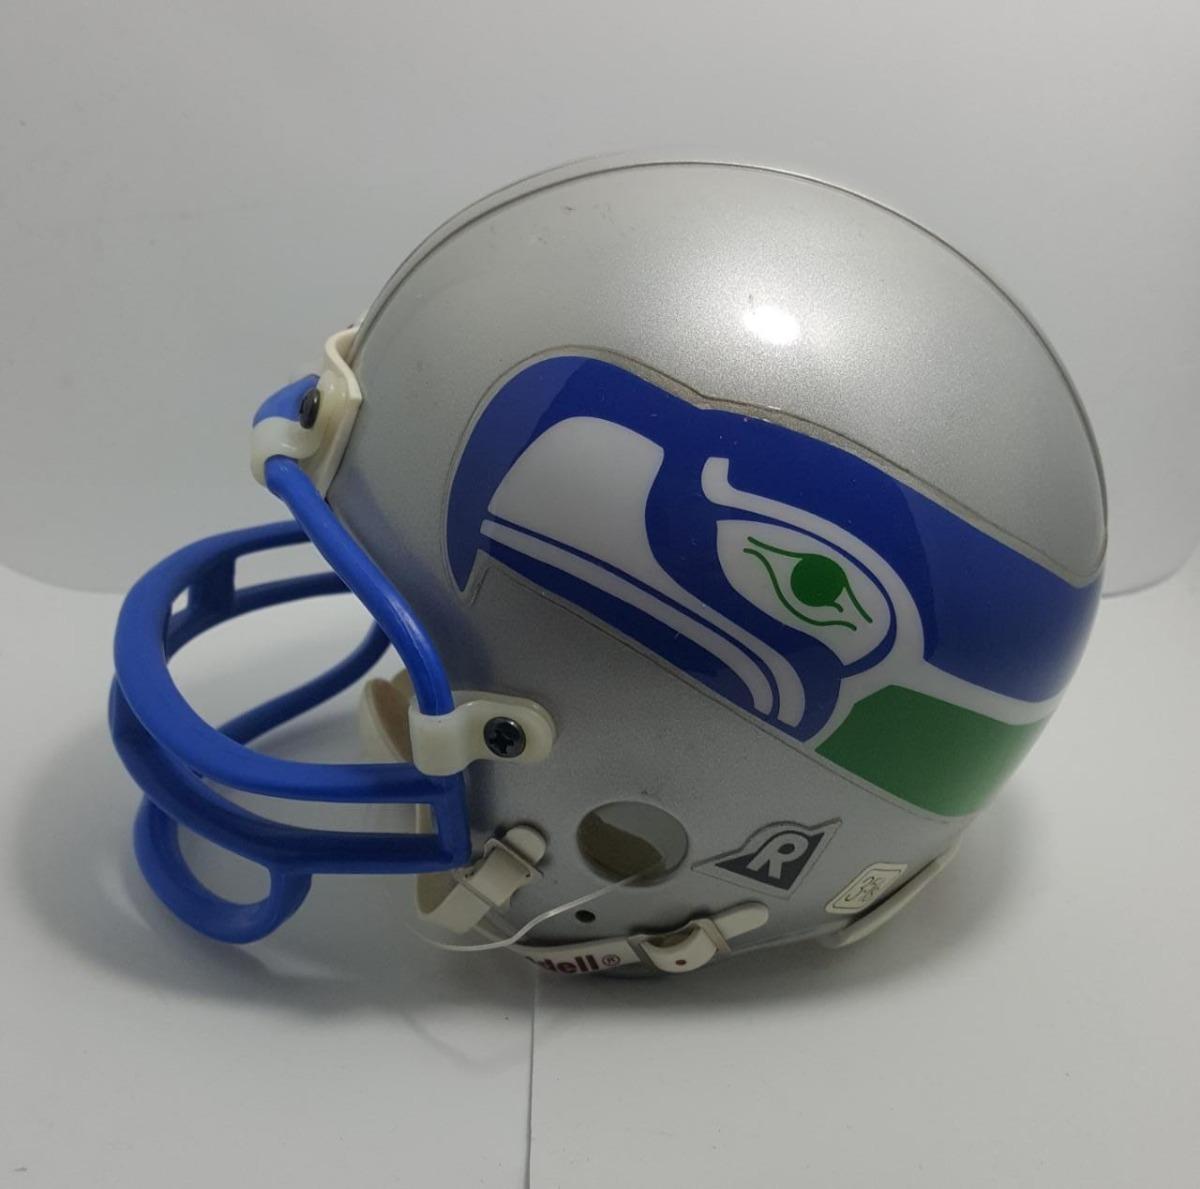 879f525204037 mini capacete futebol americano nfl - seattle seahawks prata. Carregando  zoom.